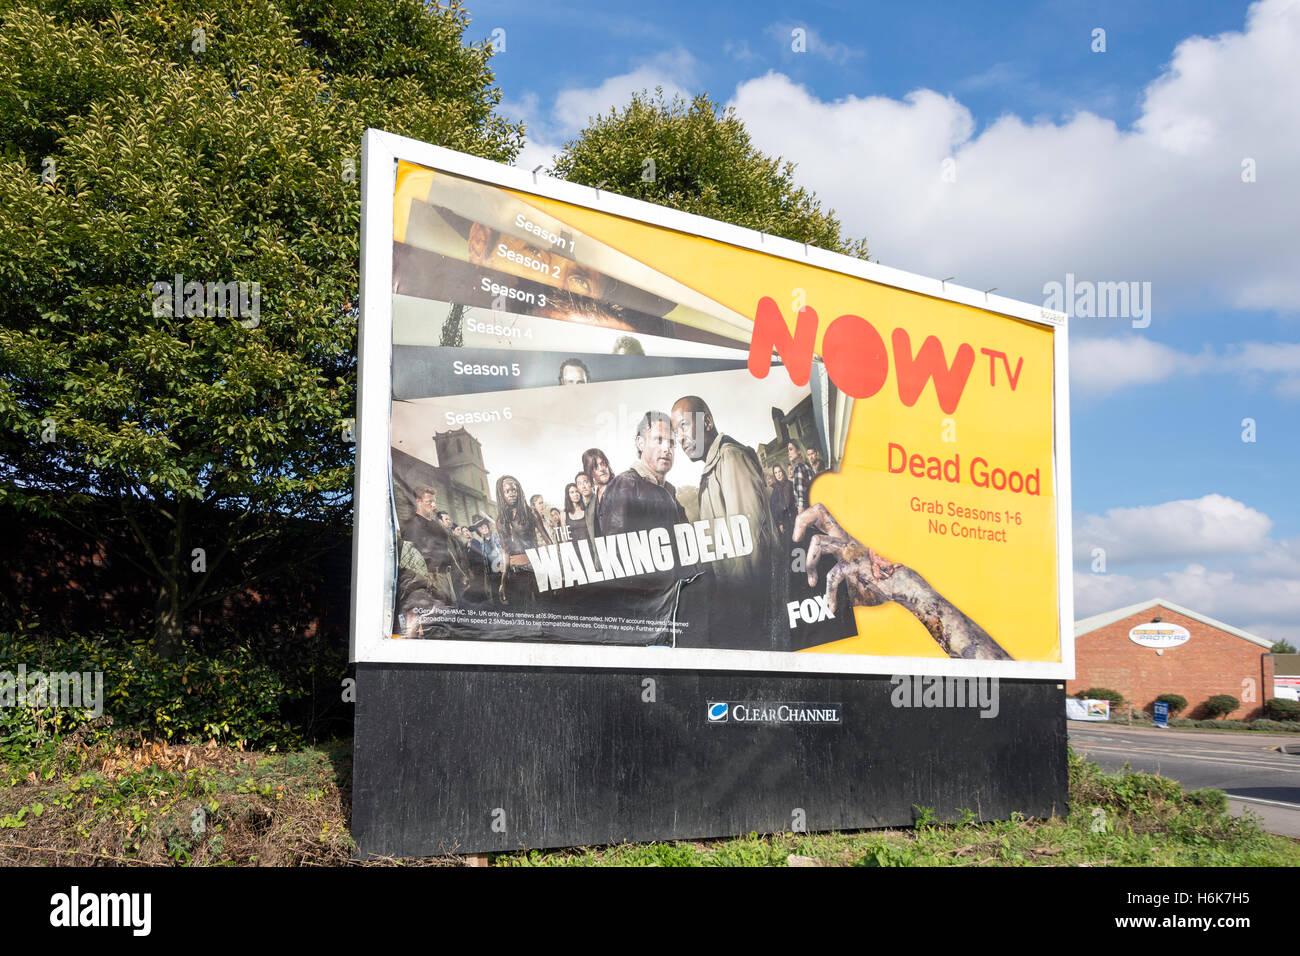 Advertising billboard, Bath Road (A4), Slough, Berkshire, England, United Kingdom - Stock Image